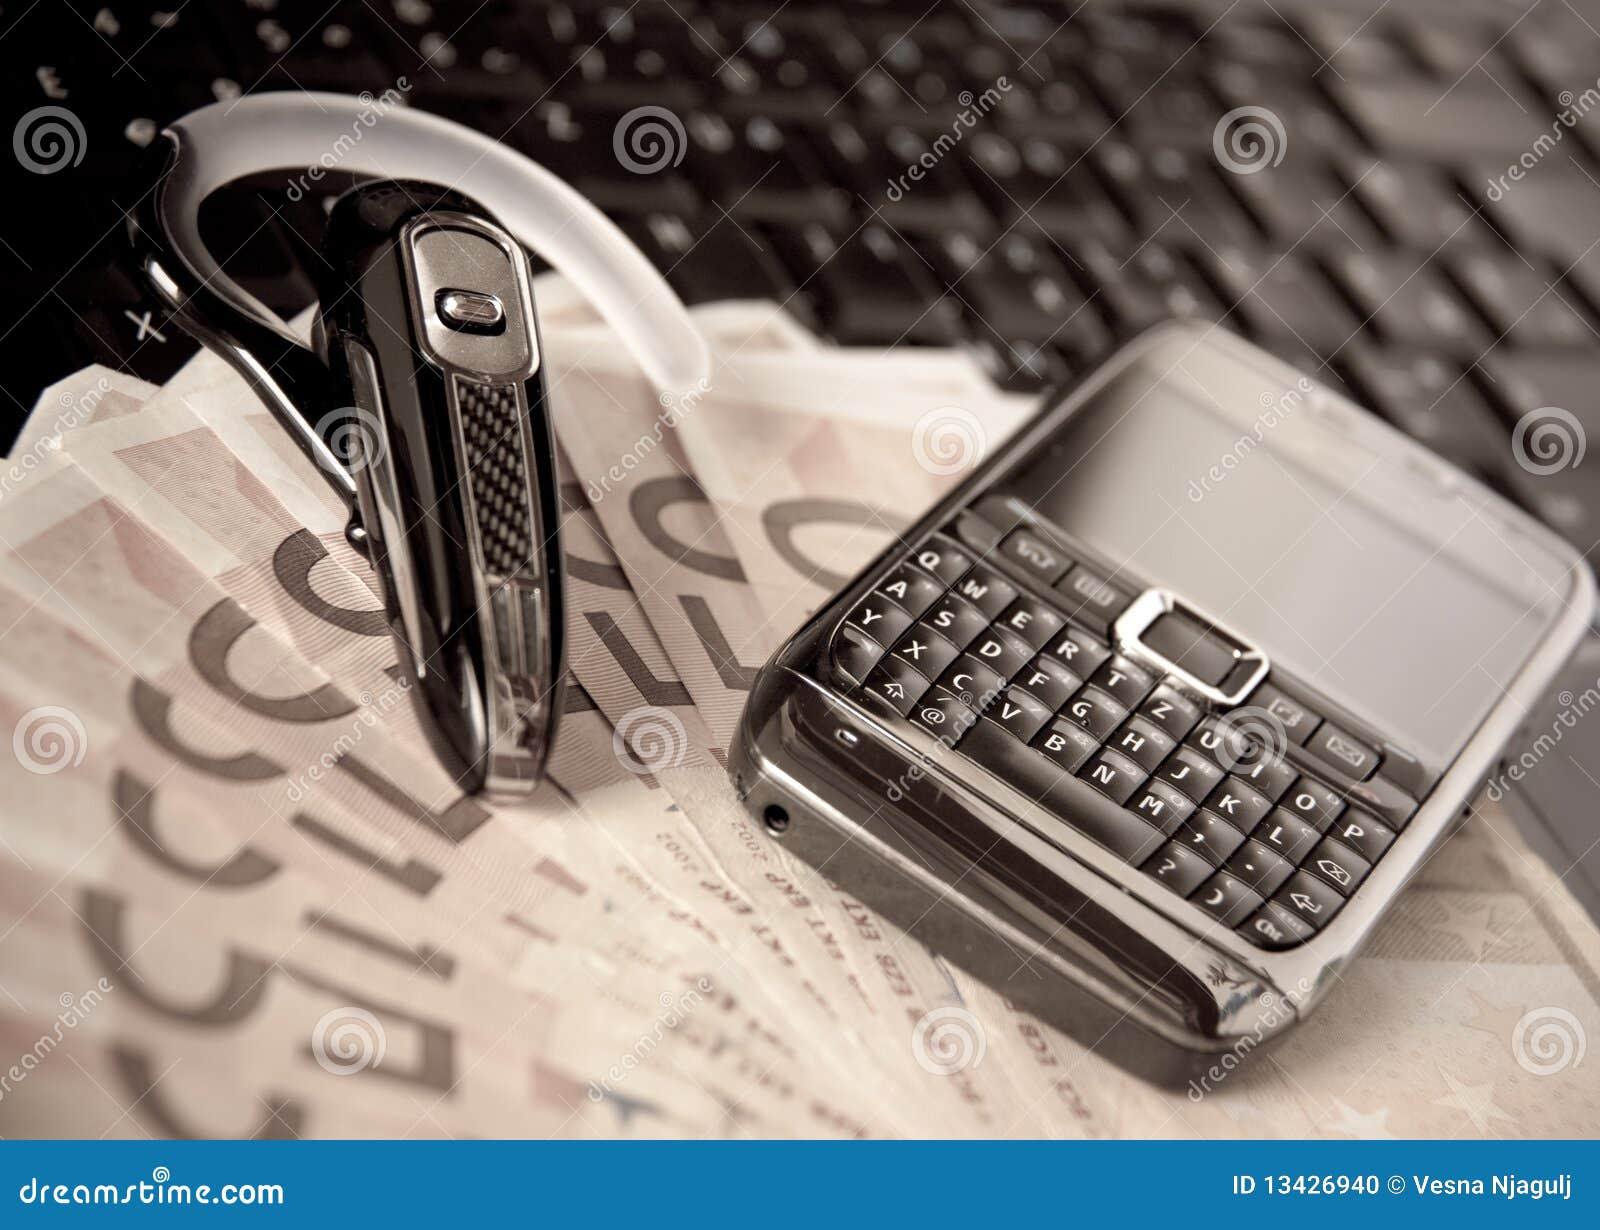 Cash Euro Money On The Keyboard Stock Image ...